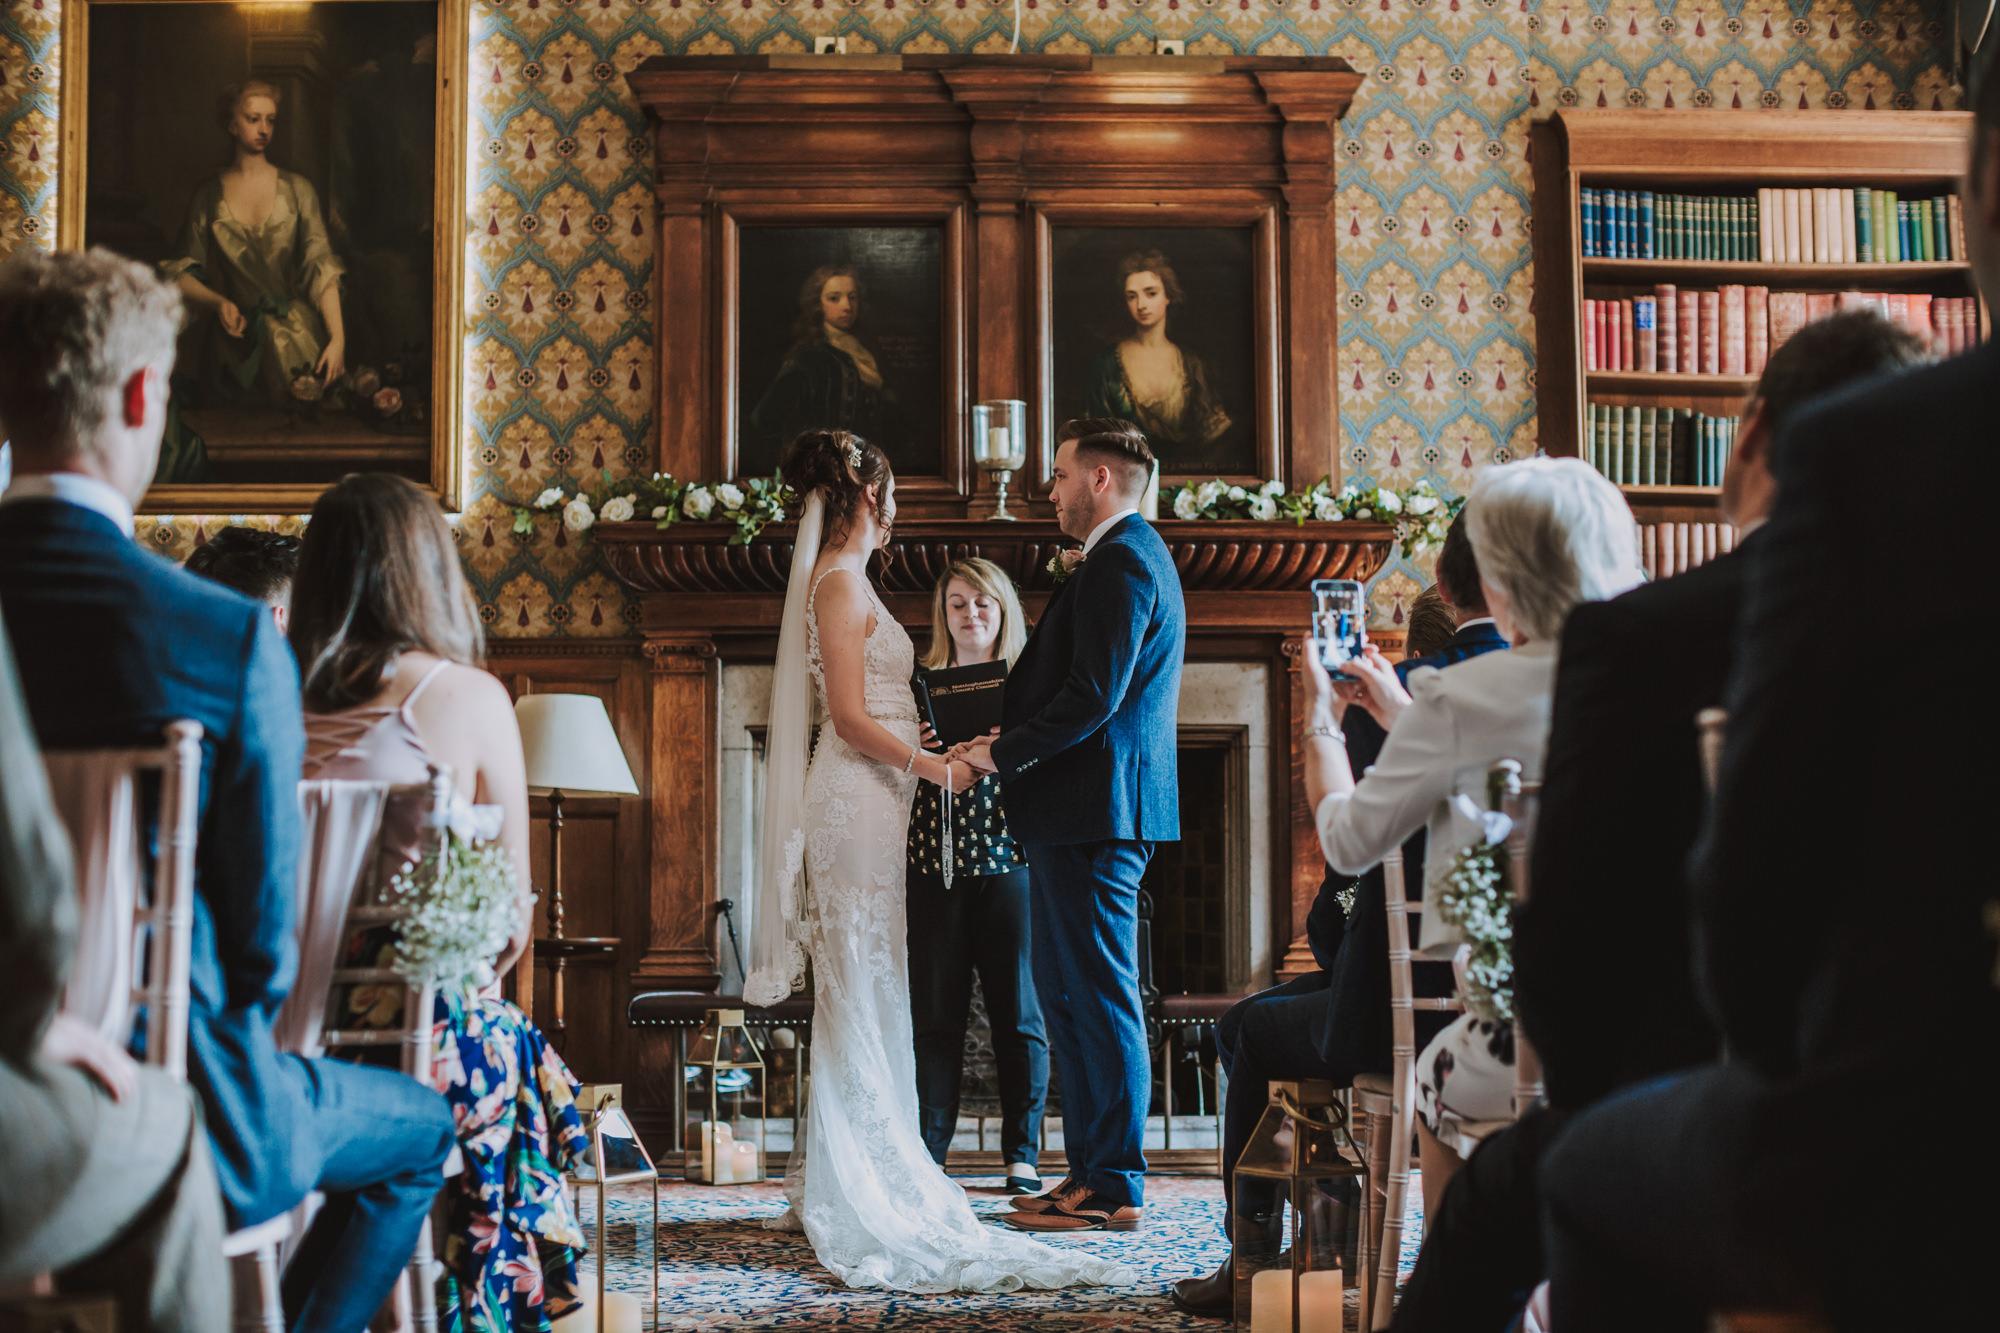 hodsock priory wedding photographers blog43.jpg